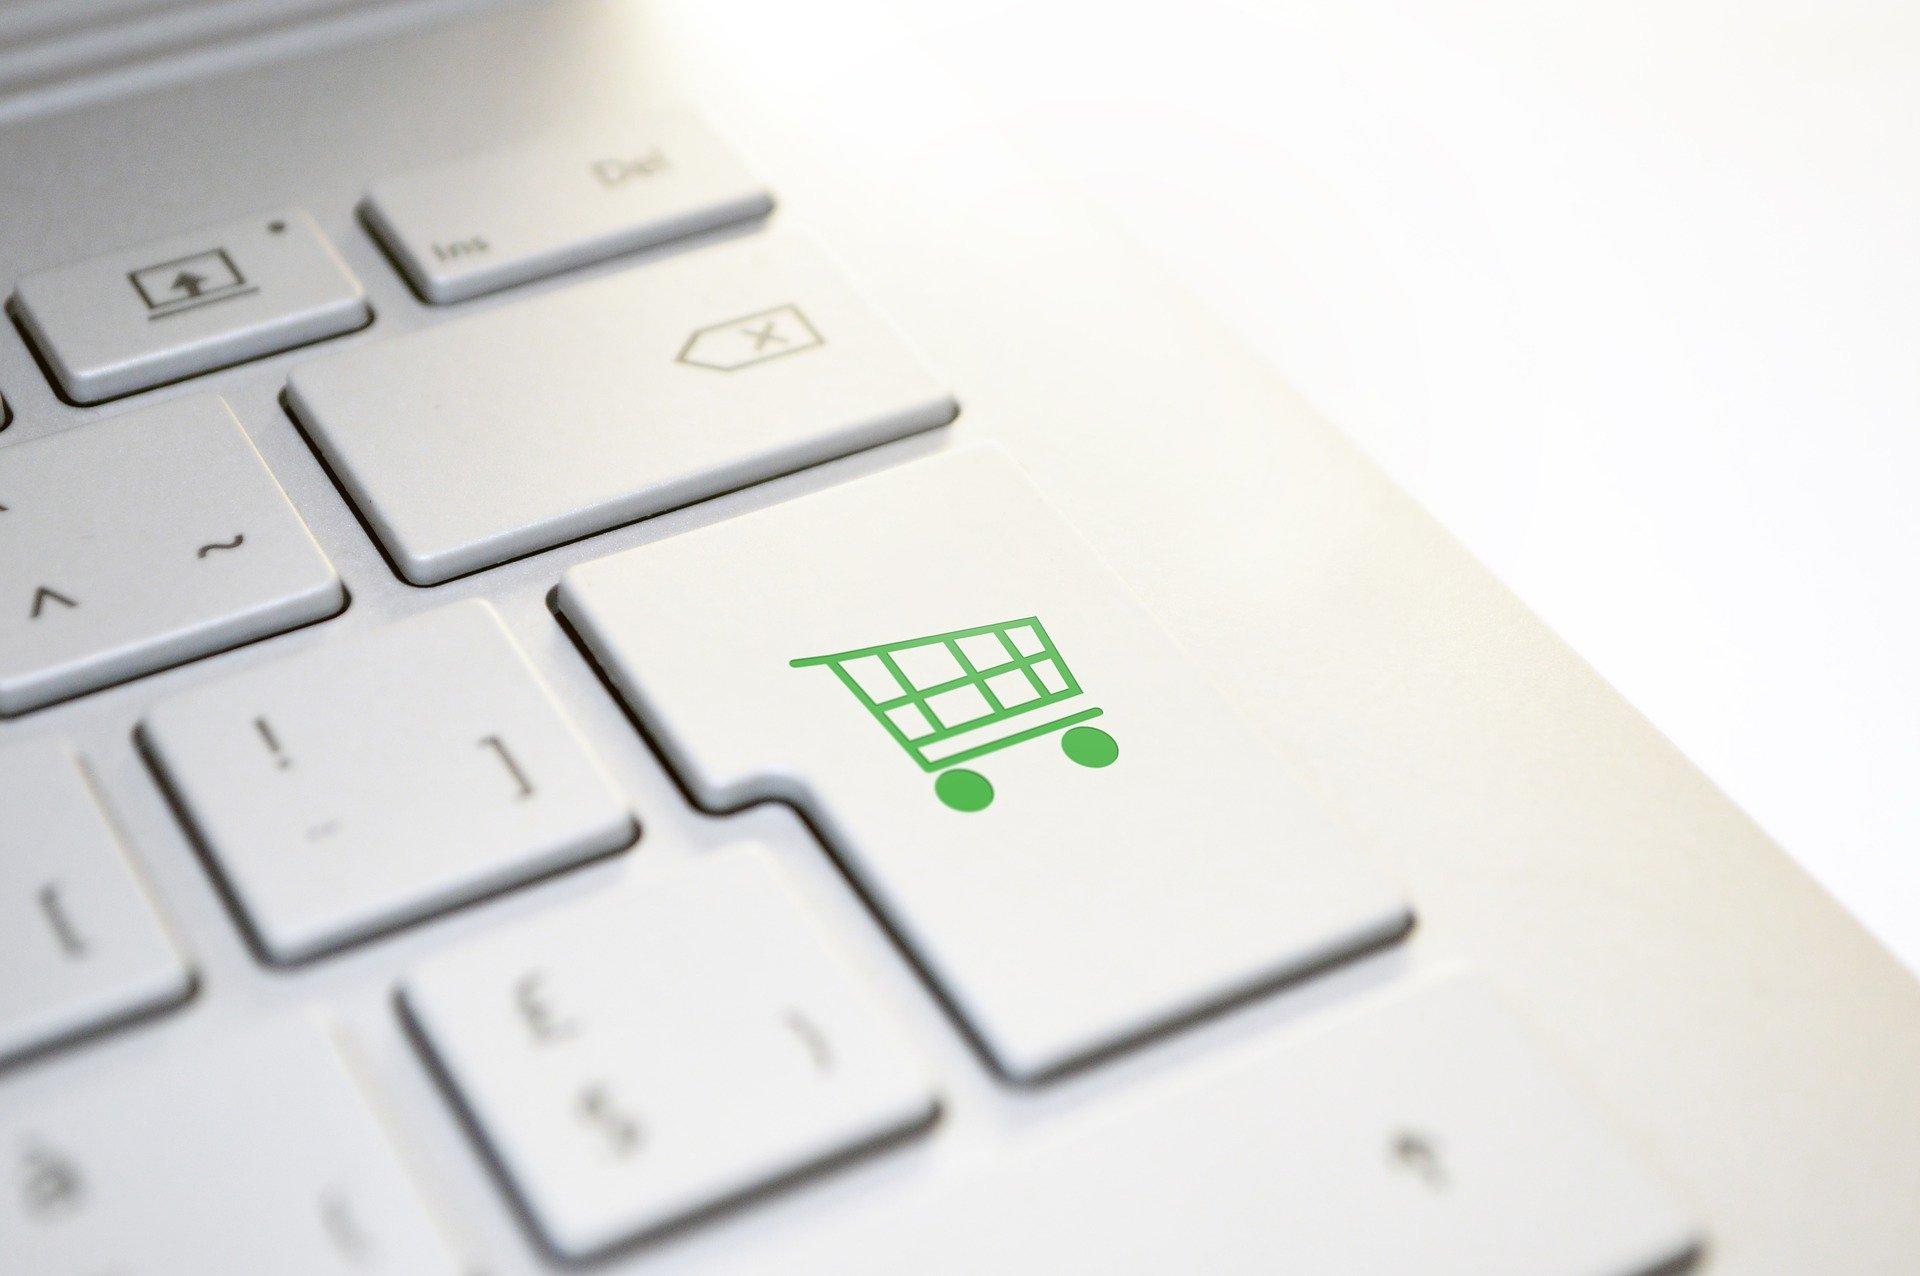 https://info.all-for-one.com/hubfs/Customer%20Experience/B4B%20Bildmaterial%20Blog/buy-3692440_1920.jpg